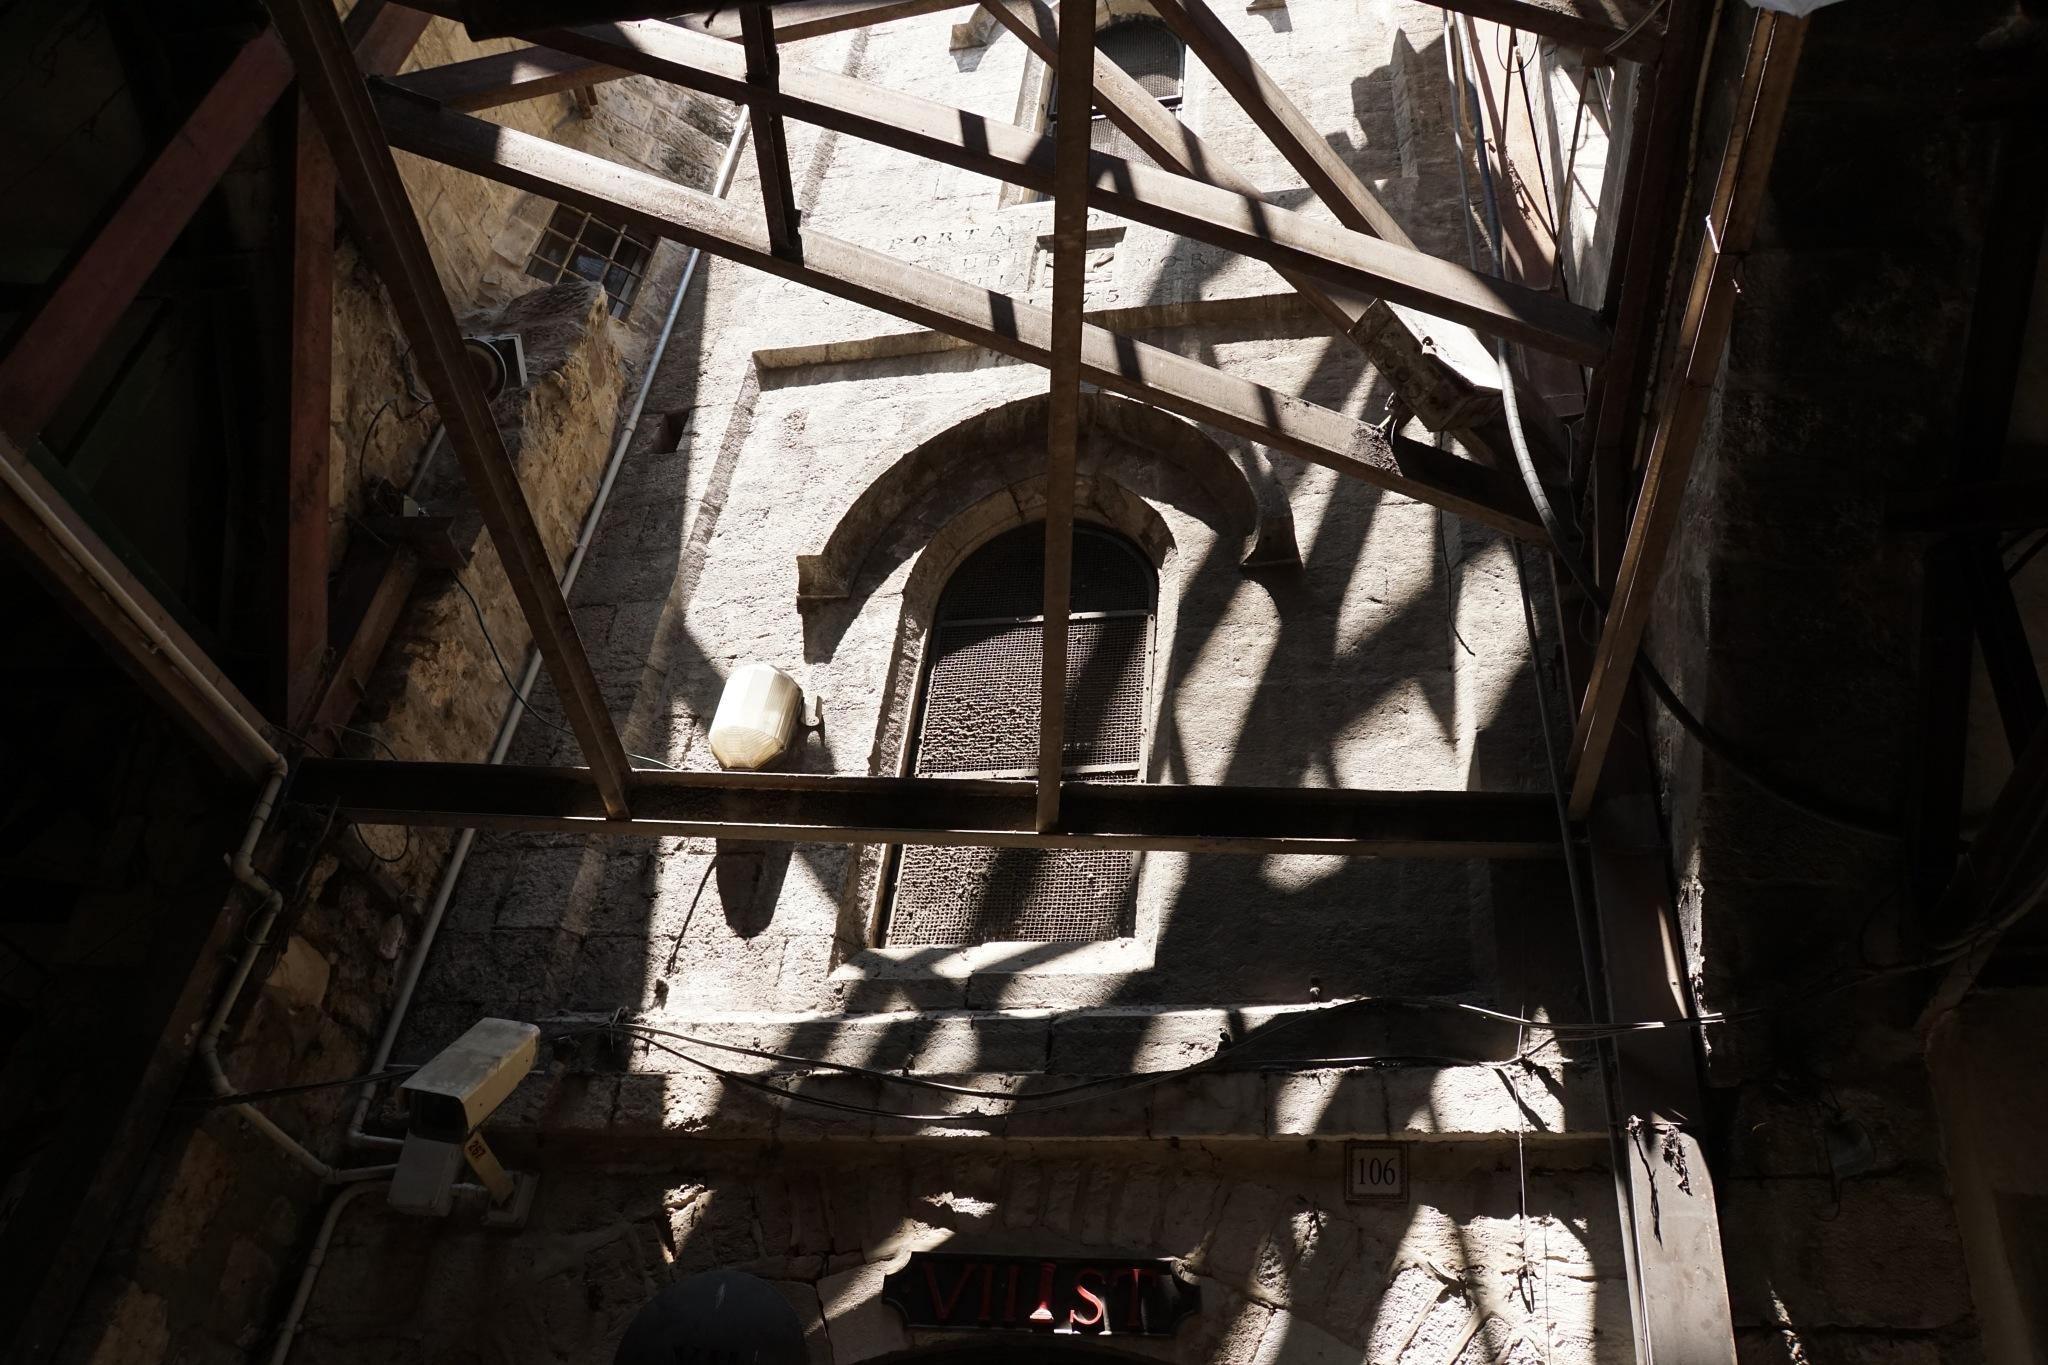 Shadows of Jerusalem by Ekaterina Fradkin